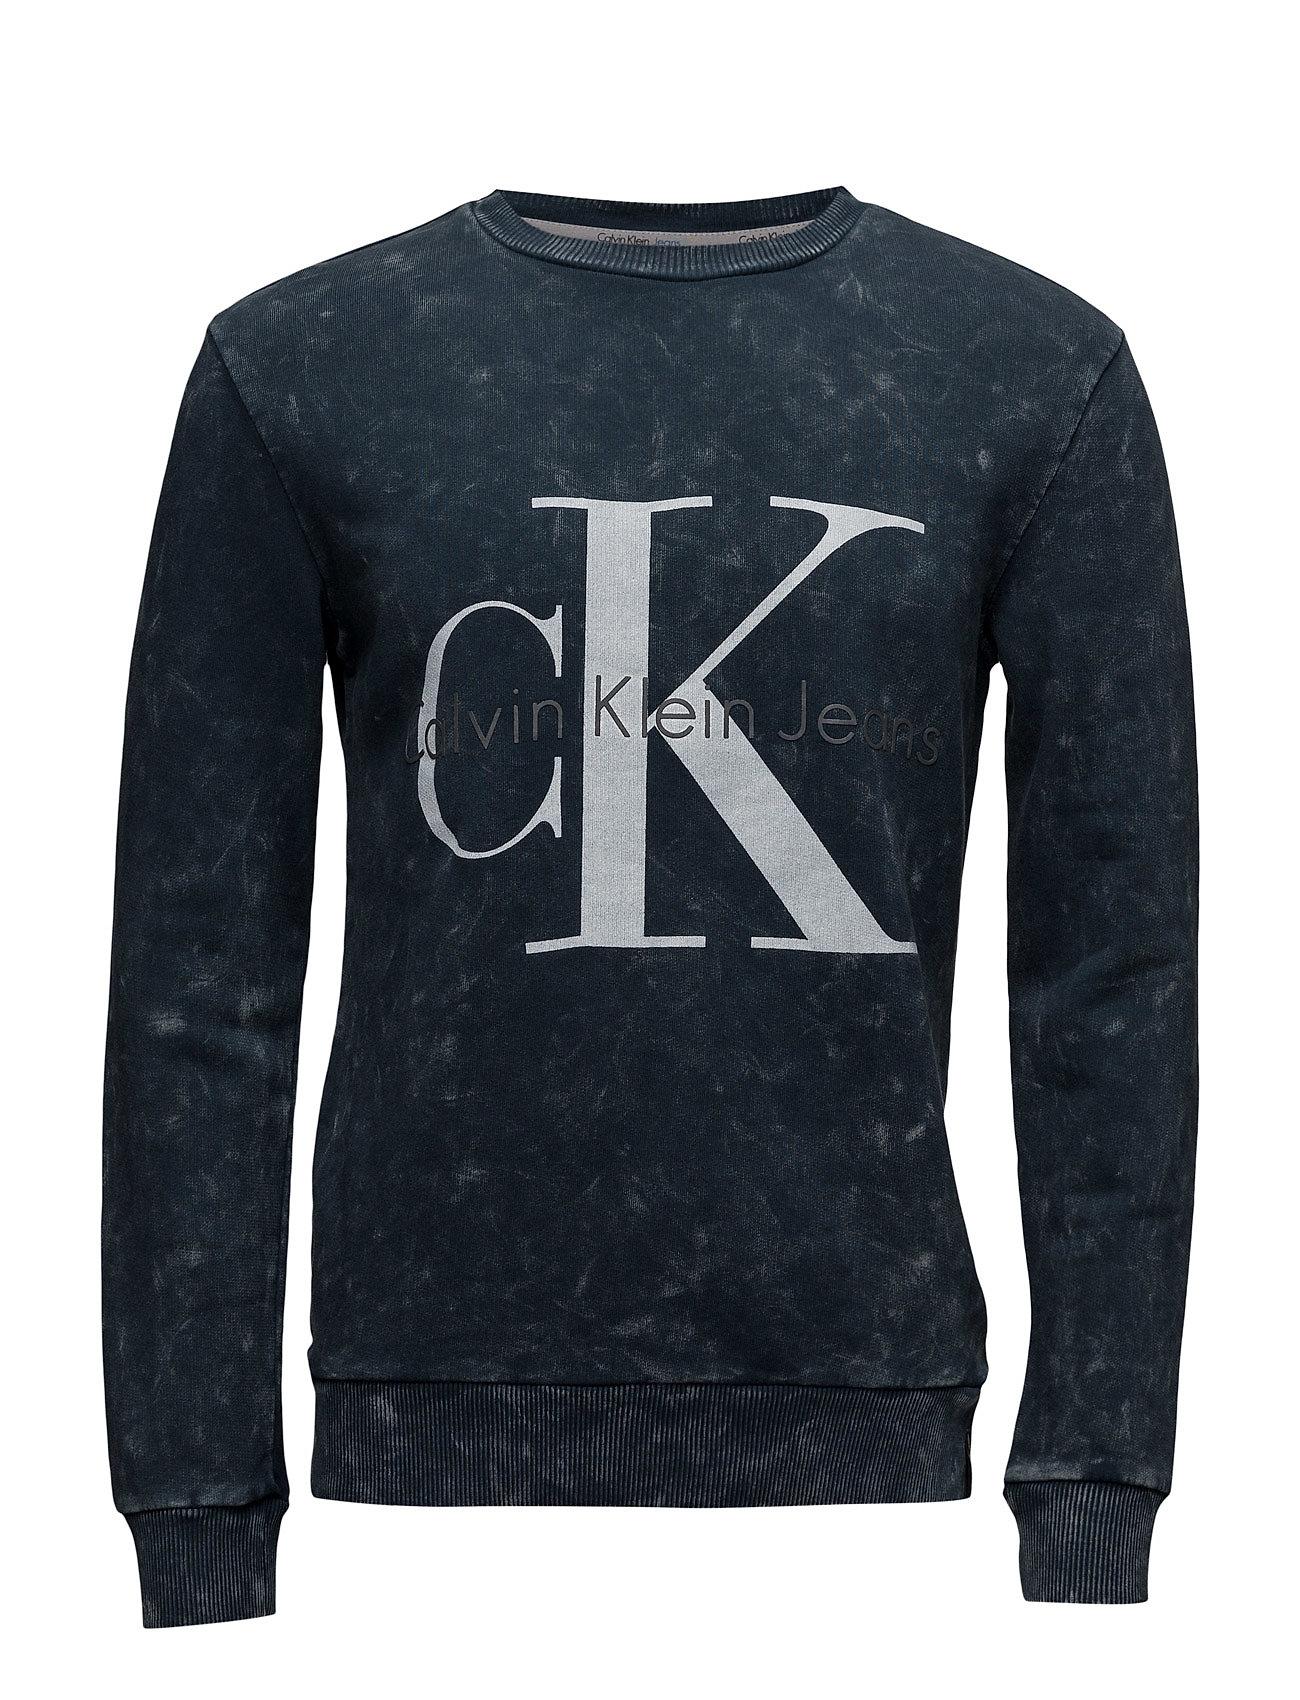 Hagg True Icon Cn Hk Calvin Klein Jeans Sweat pants til Herrer i